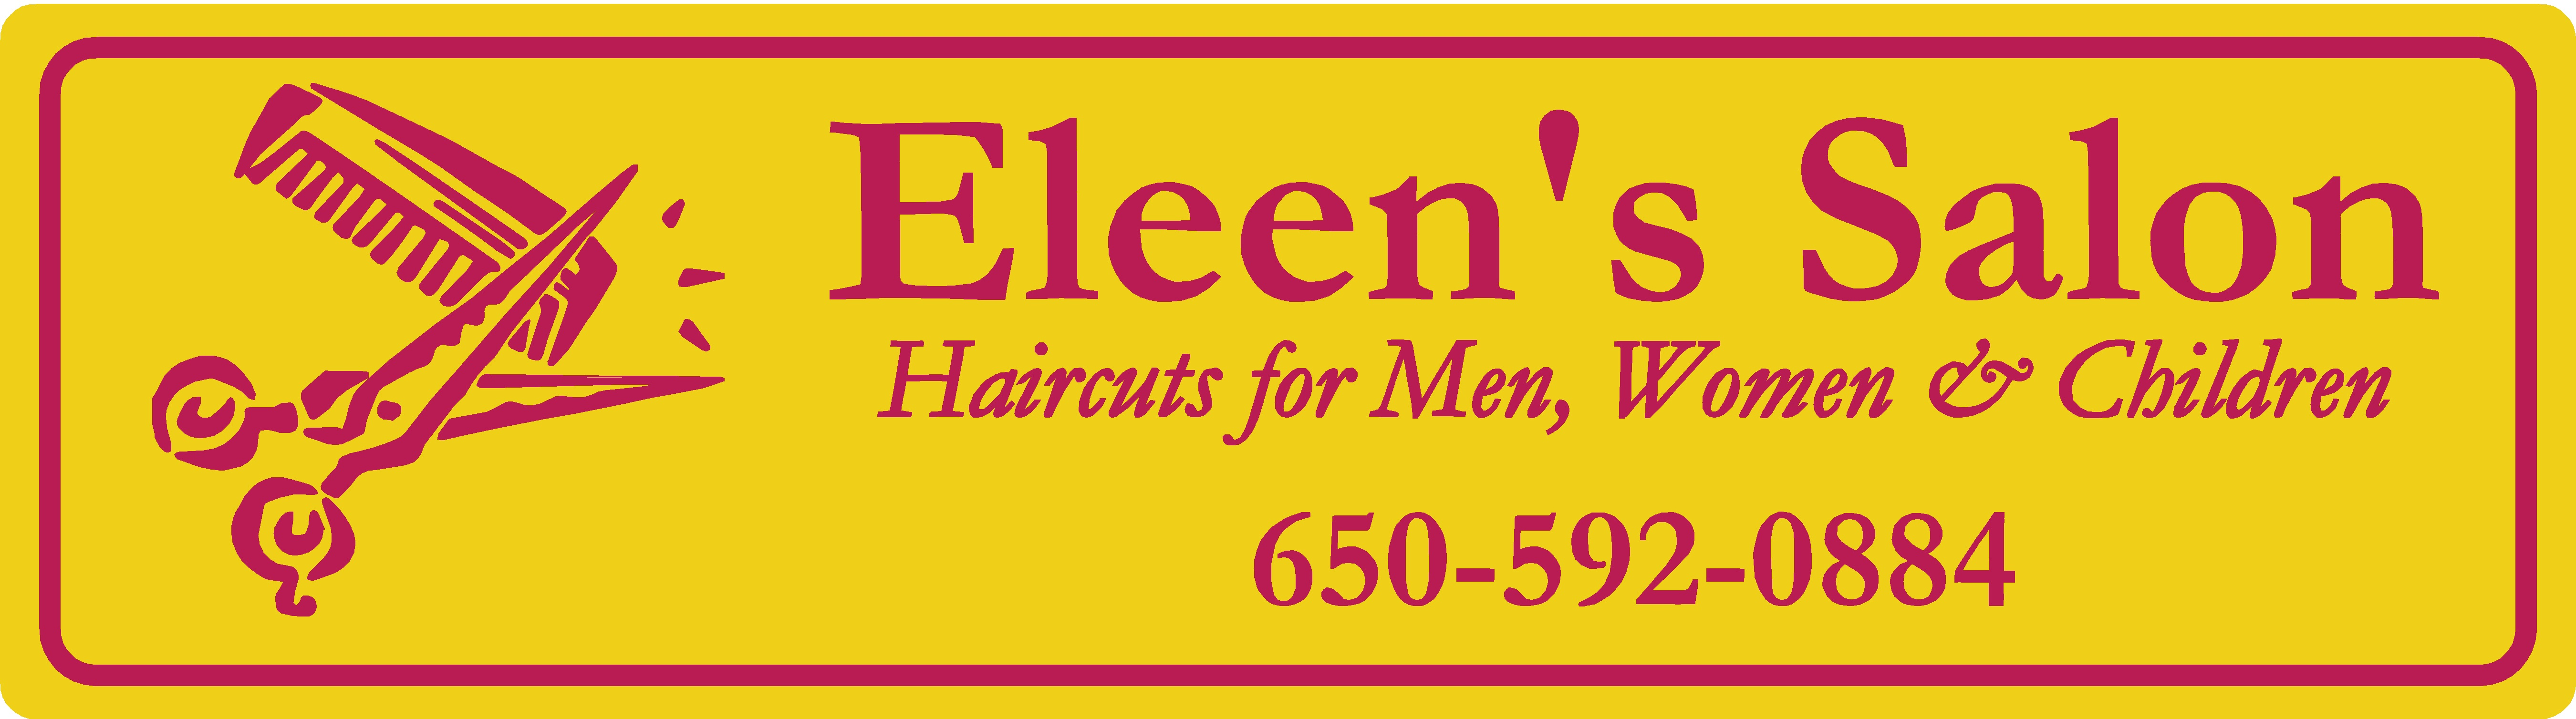 Eleens Salon2